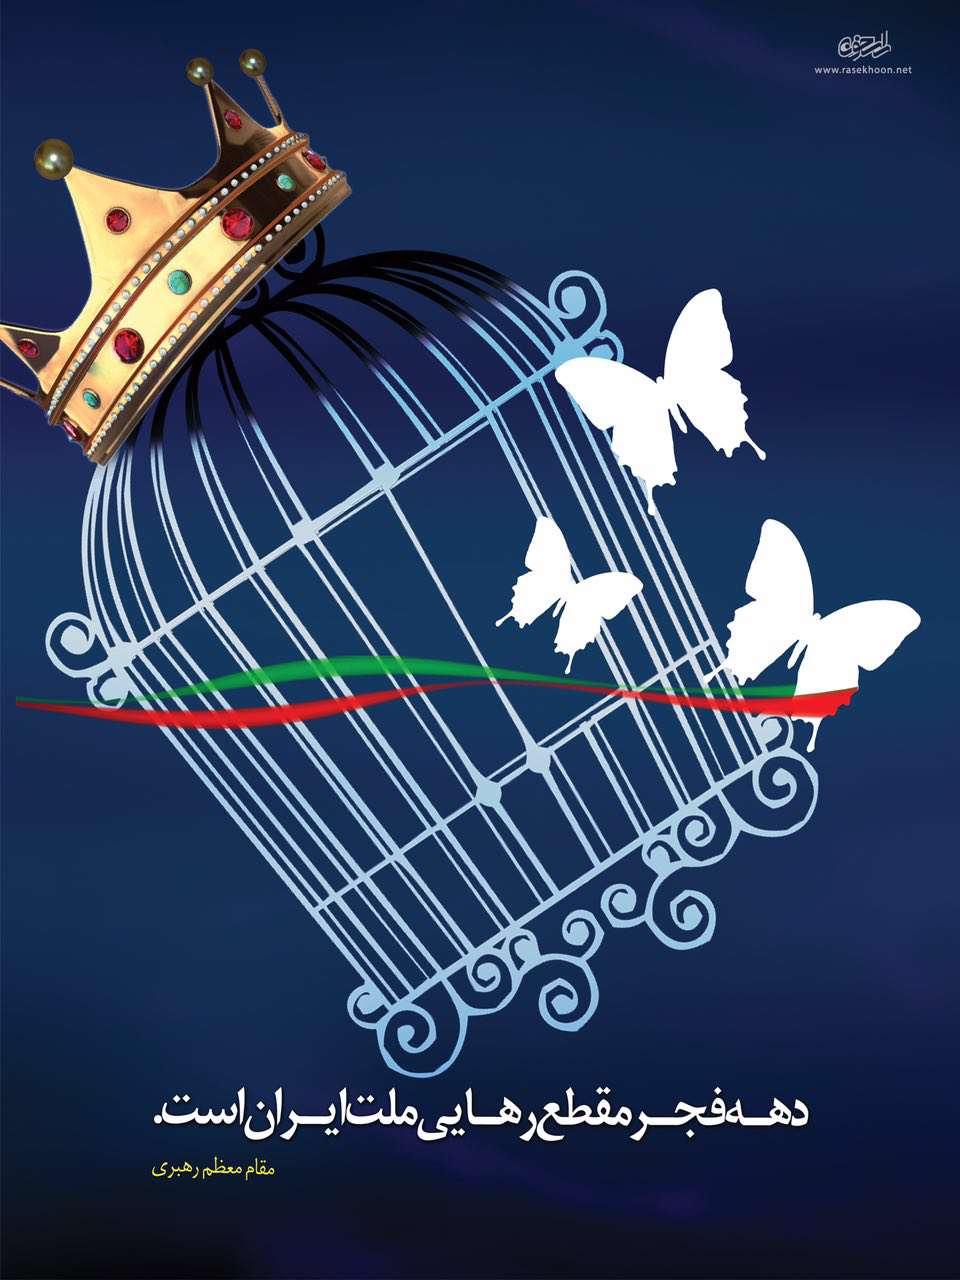 مقطع رهايي ملت ايران